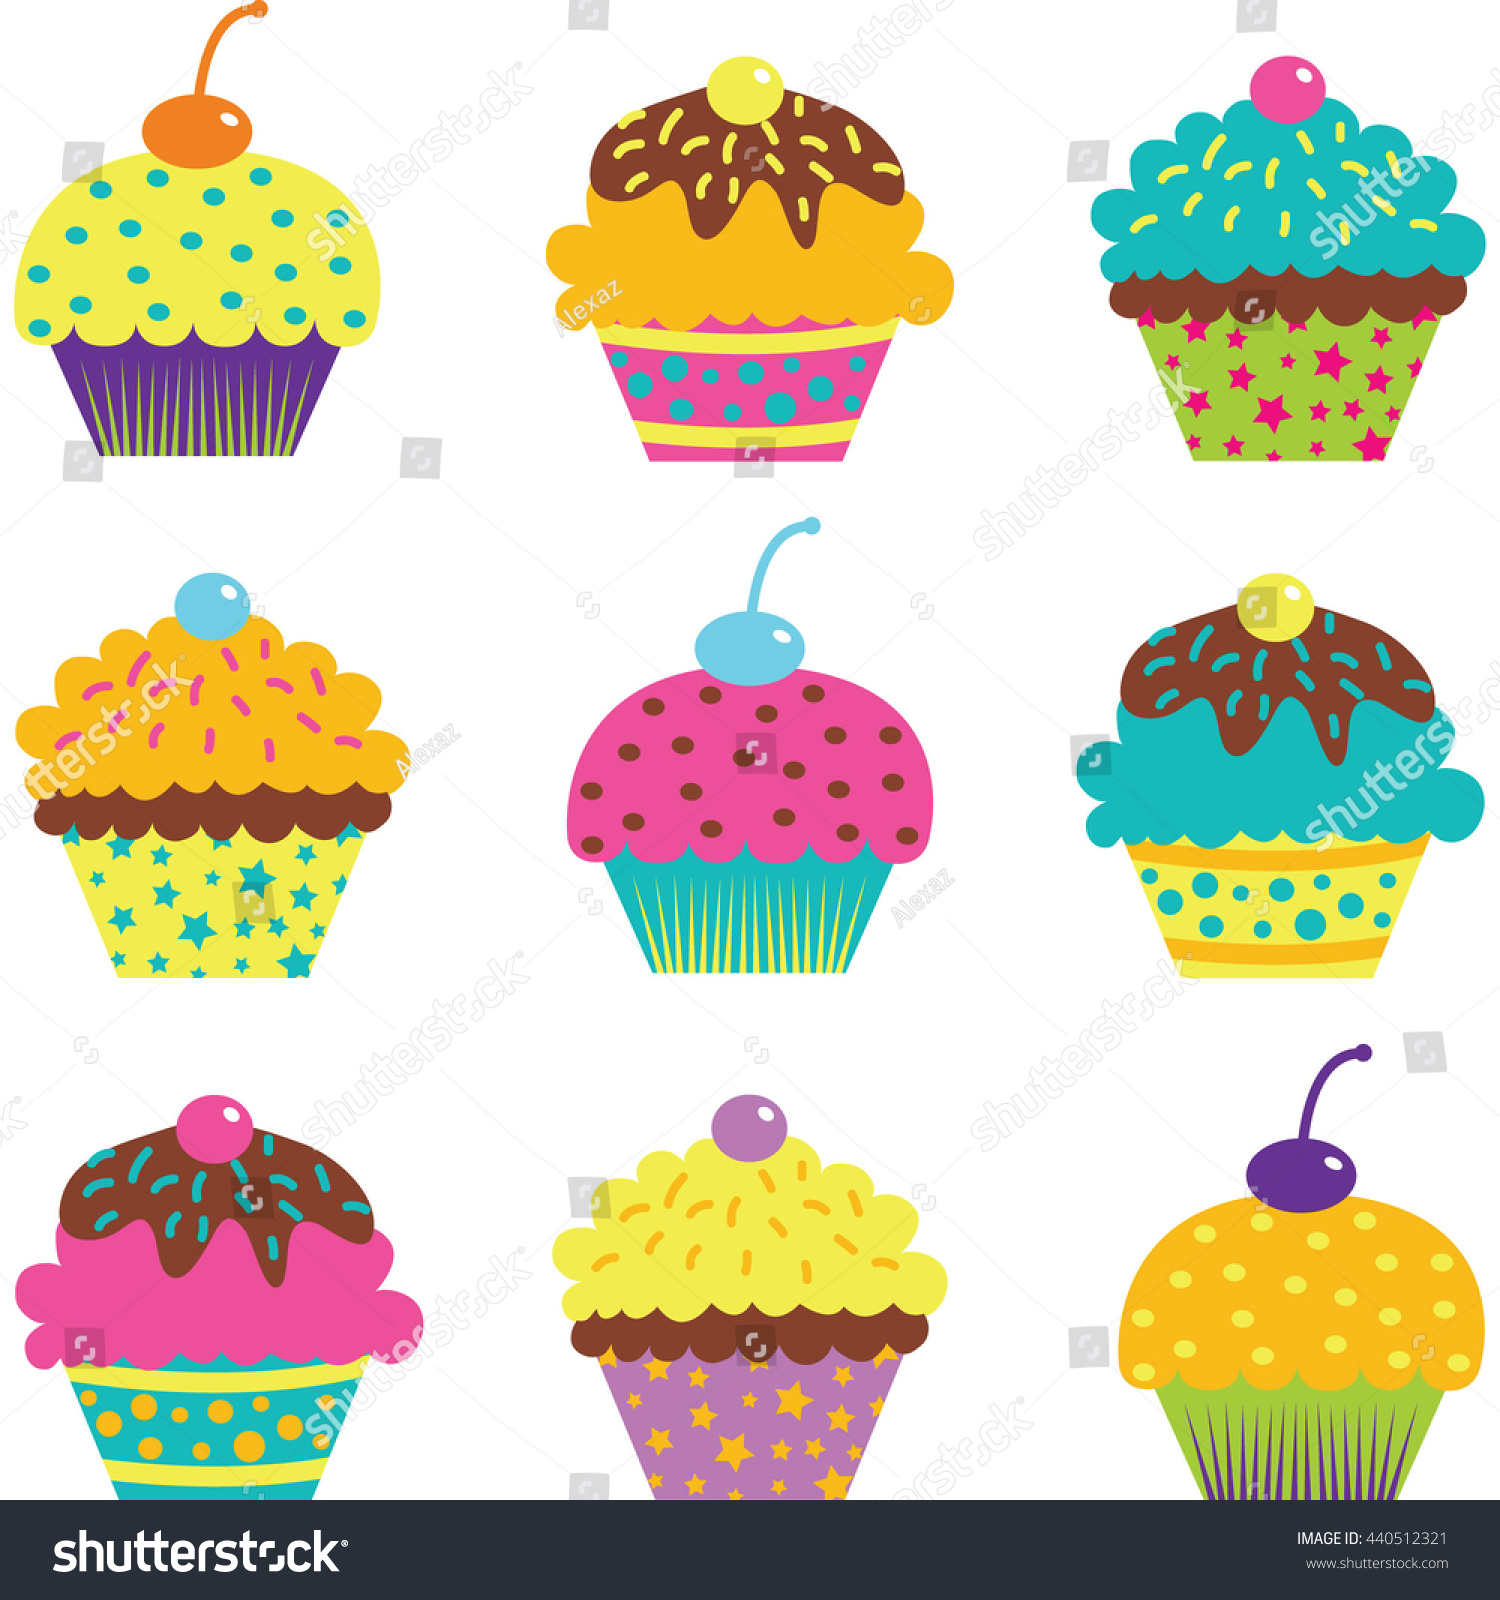 Cup Cake Setbirthdaypartyinvitation Stock Vector 440512321 ...